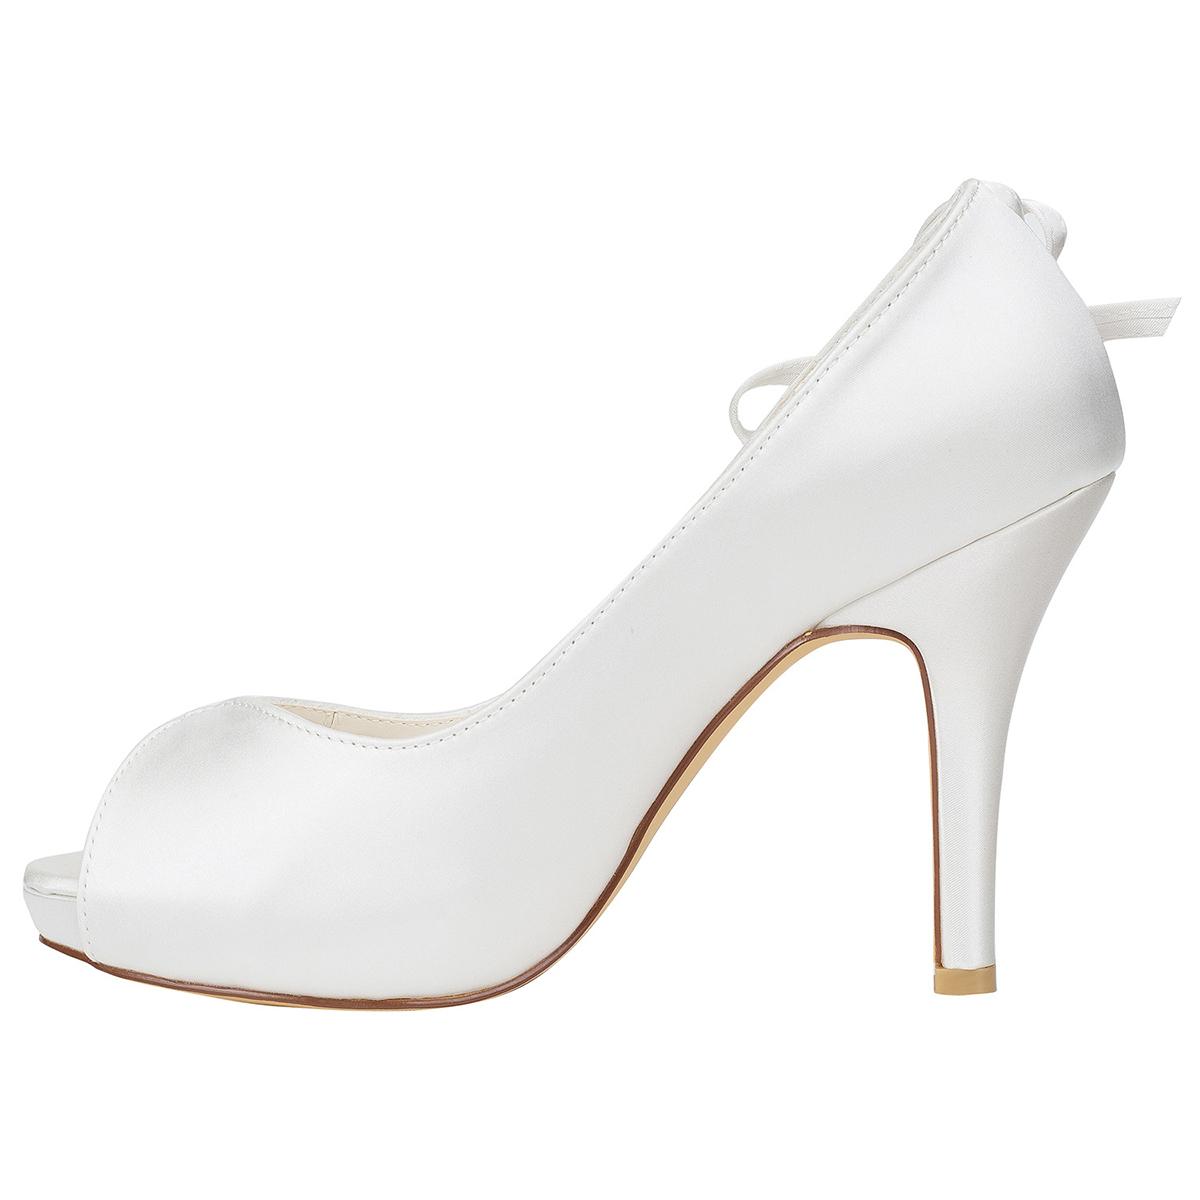 Peep Toe Platform Stiletto Heel Charmeuse Wedding Shoes With Rhinestone